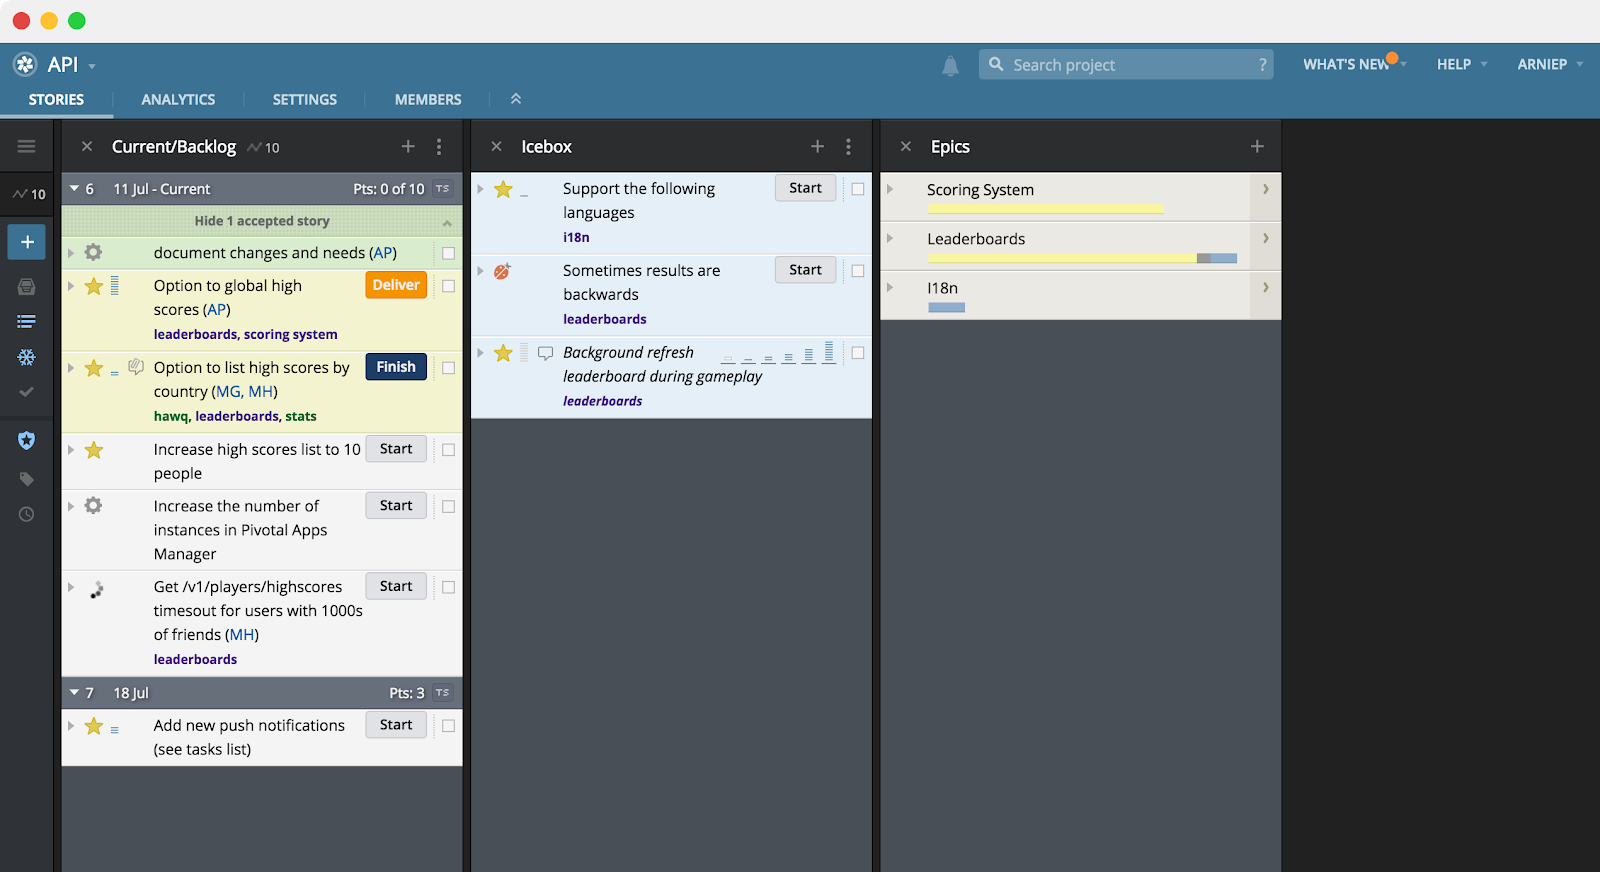 project management challenges: project management tools